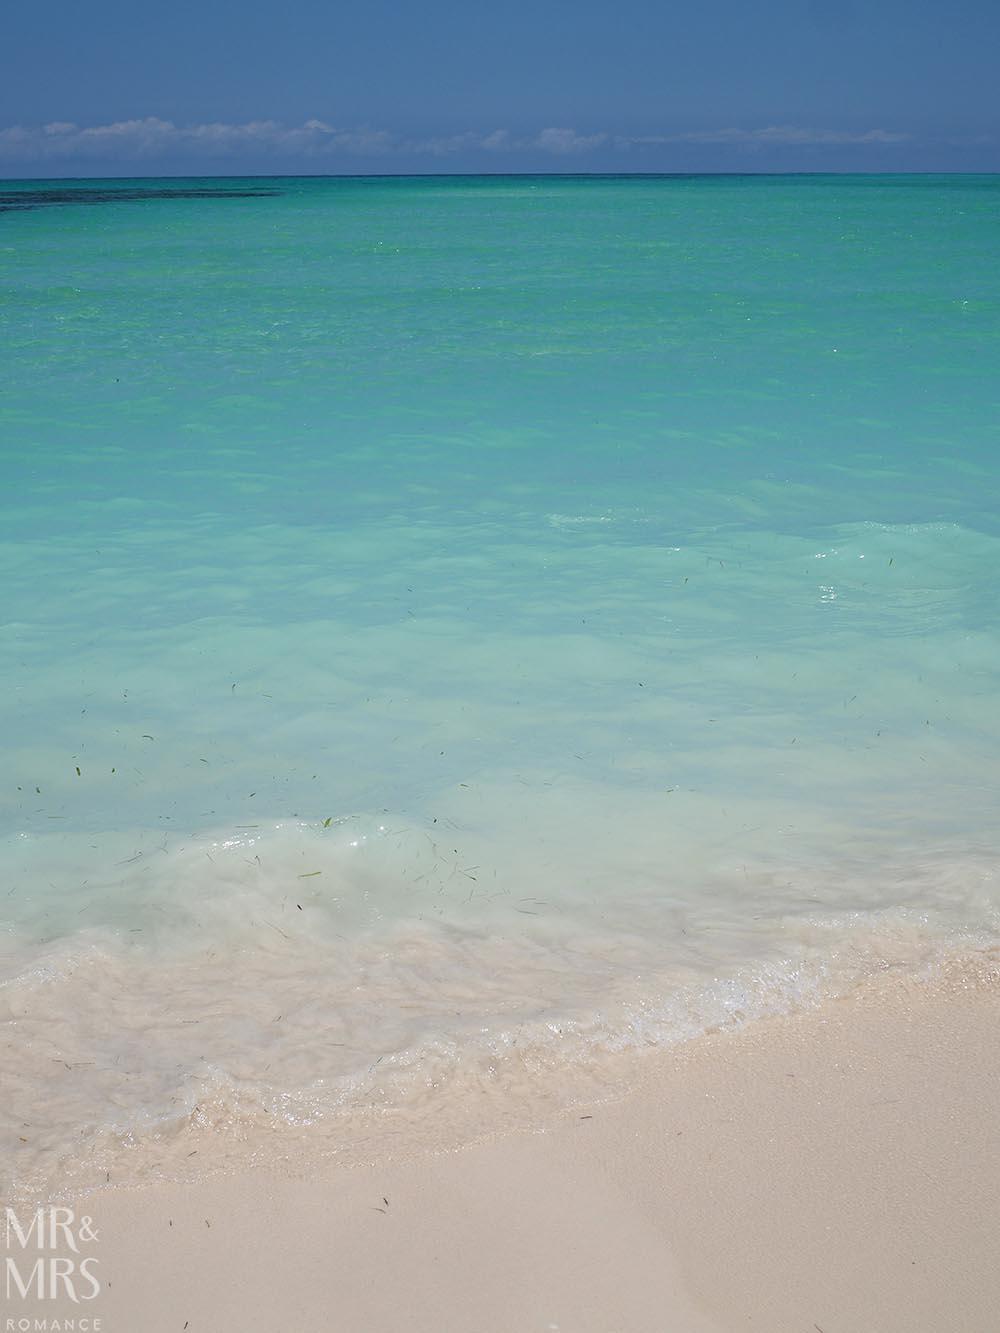 Cayo Levisa, Cuba - the Caribbean